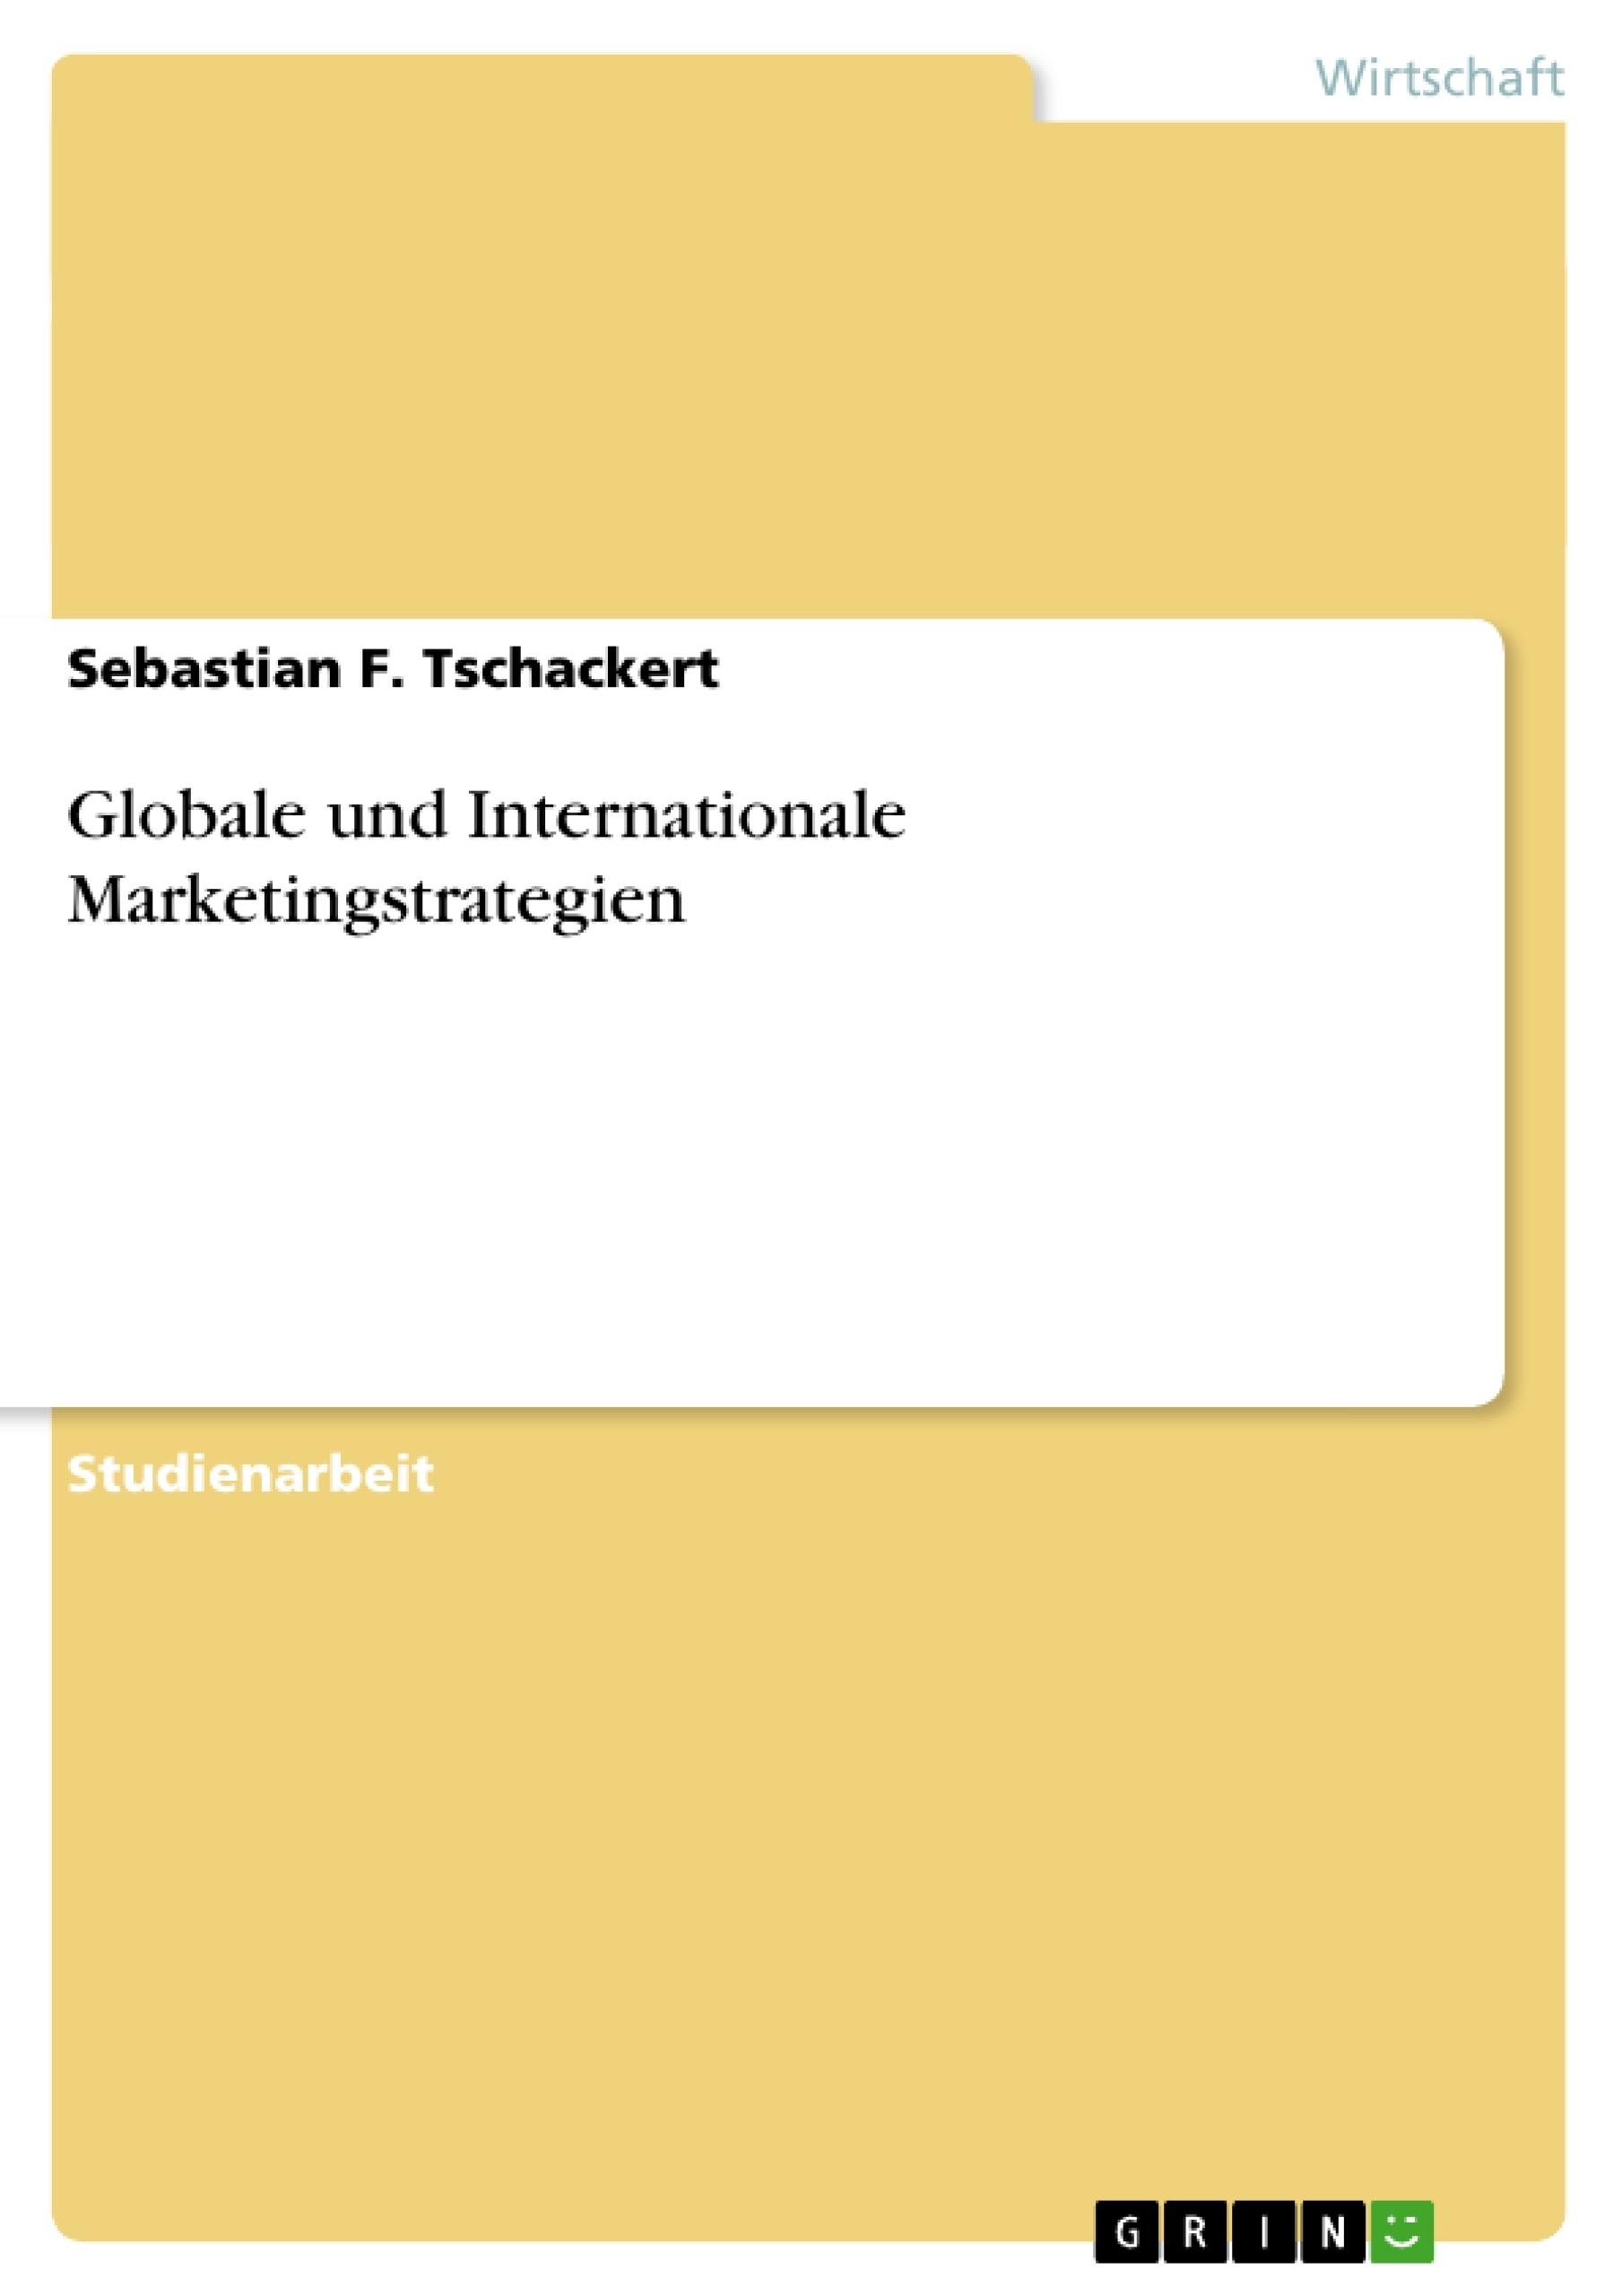 Titel: Globale und Internationale Marketingstrategien